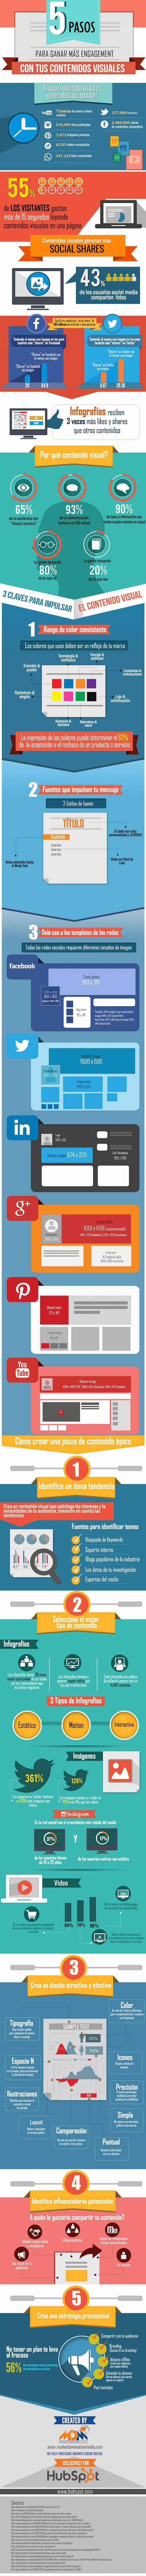 Infografia sobre 5 pasos para generar engagement con contenido visual